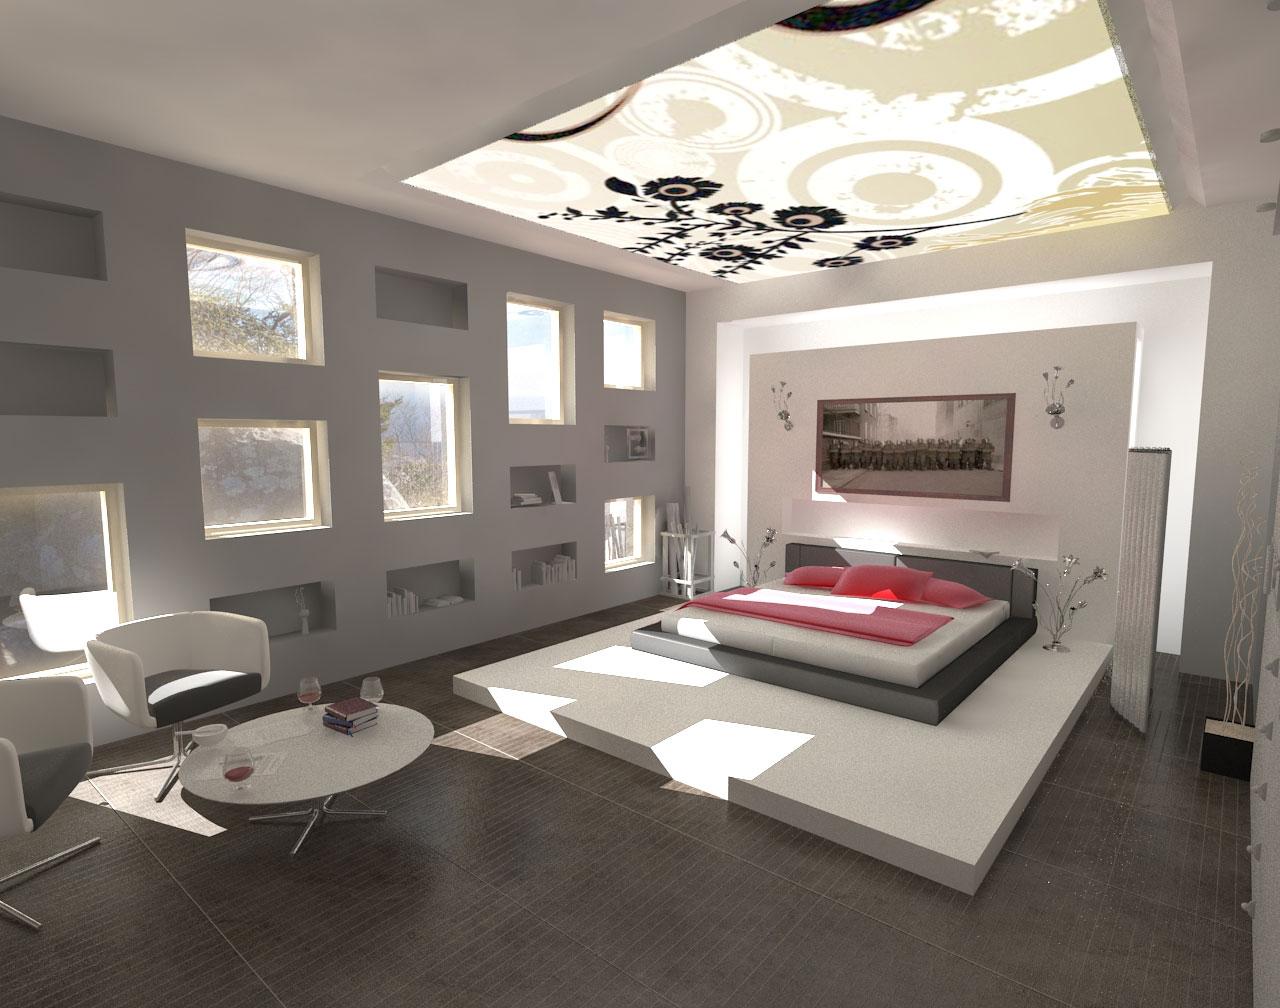 Decorations: Minimalist Design - Modern Bedroom Interior Design Ideas